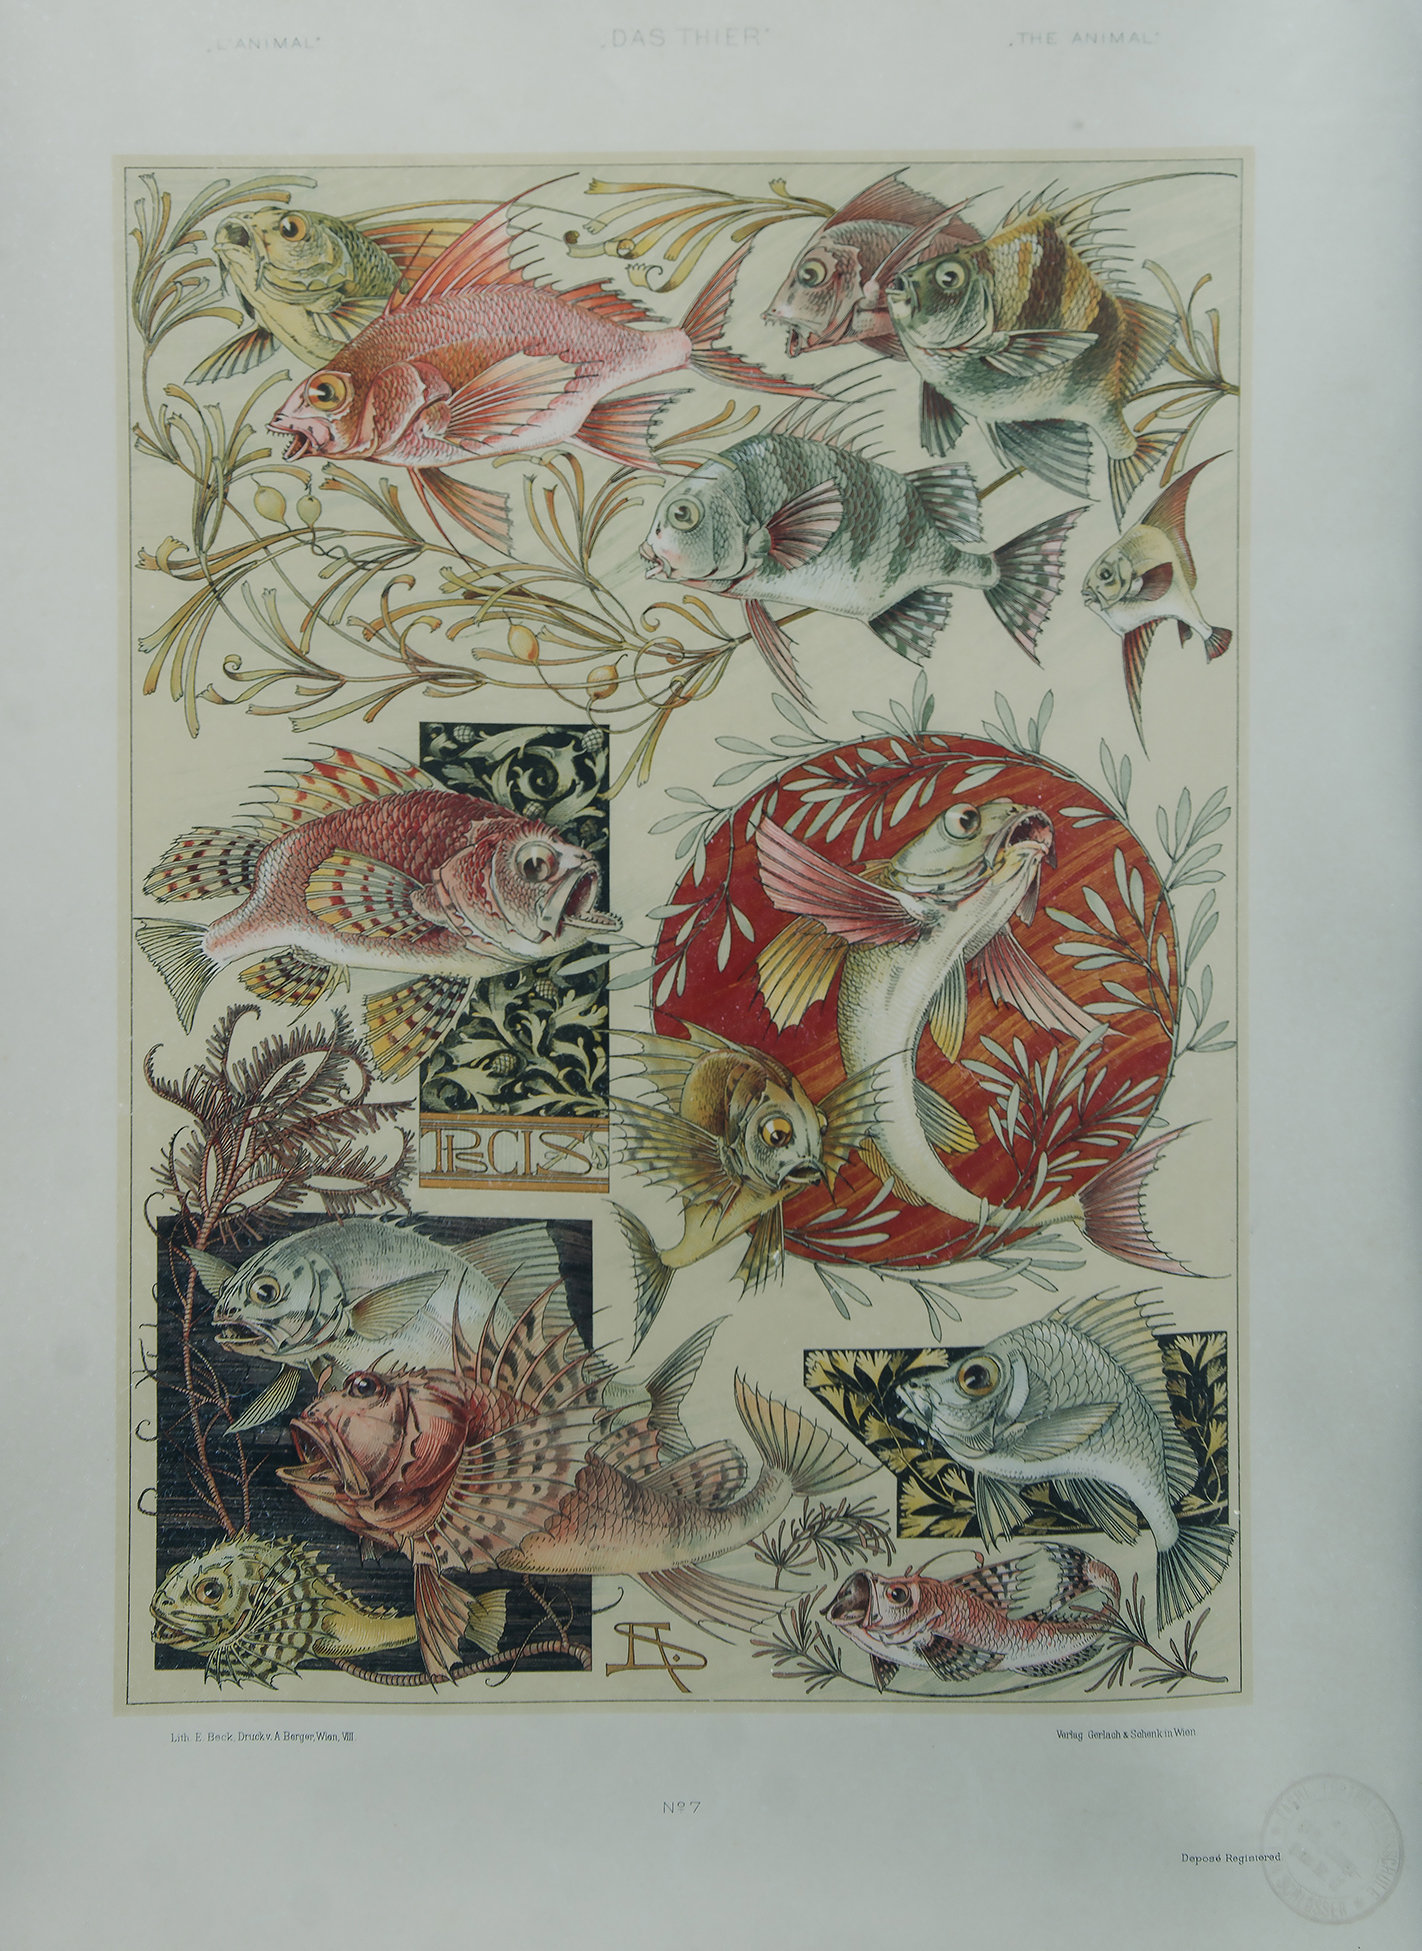 A BERGER (Vienna): 'Das Thier,' from 'L' Animal ' c1910s pub by Gerlach &  Schenk  Austrian Jugendstil Lithograph of Fish